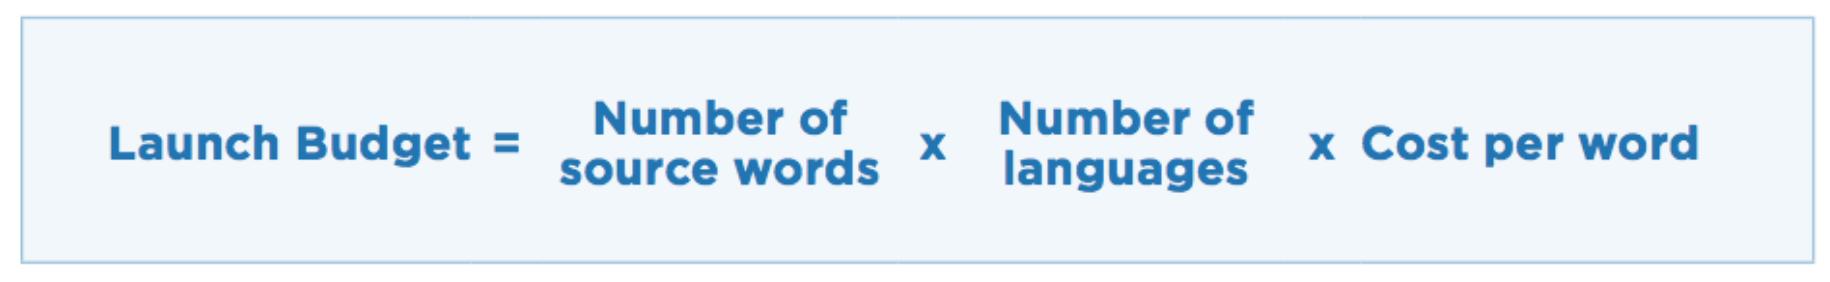 Translation Launch Budget Equation